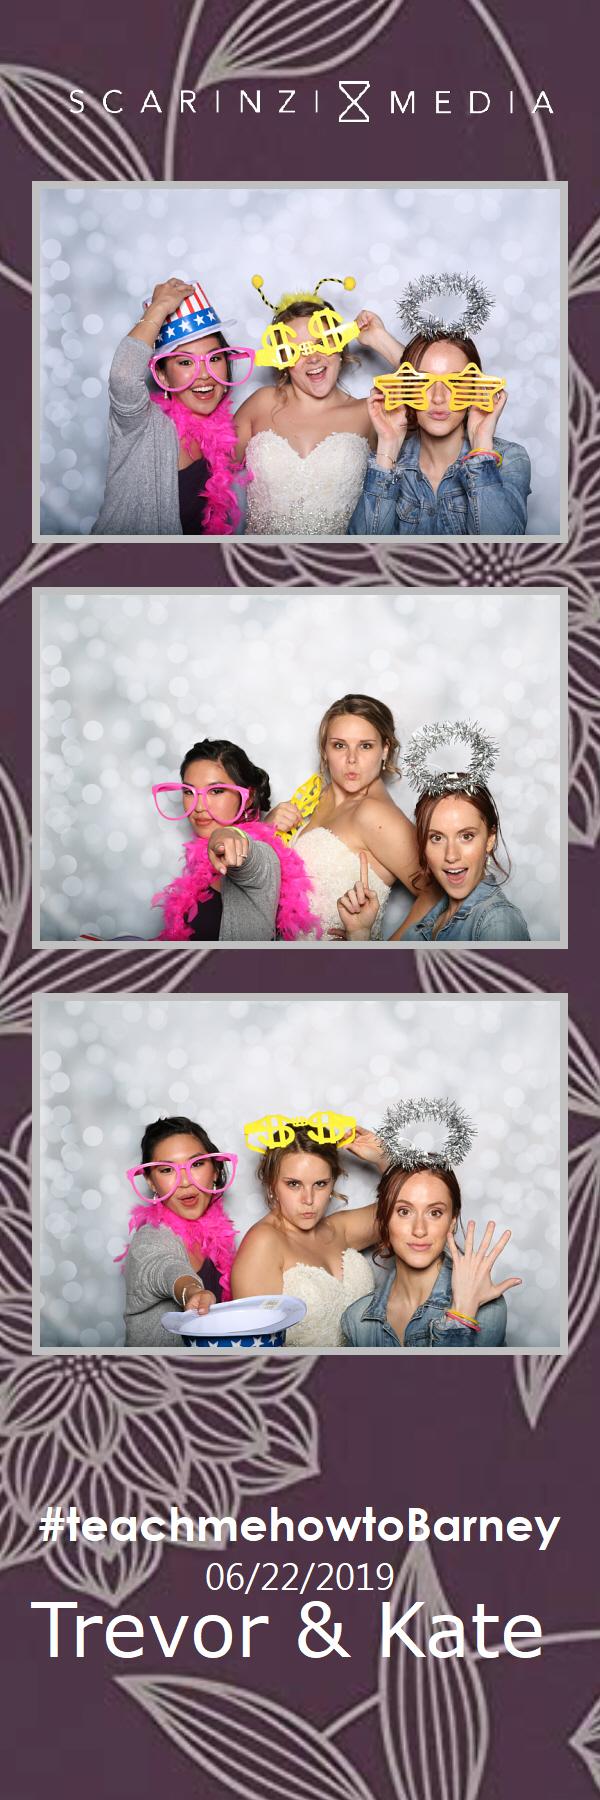 2019.06.22 - Barney Wedding PHOTOBOOTH63.jpg